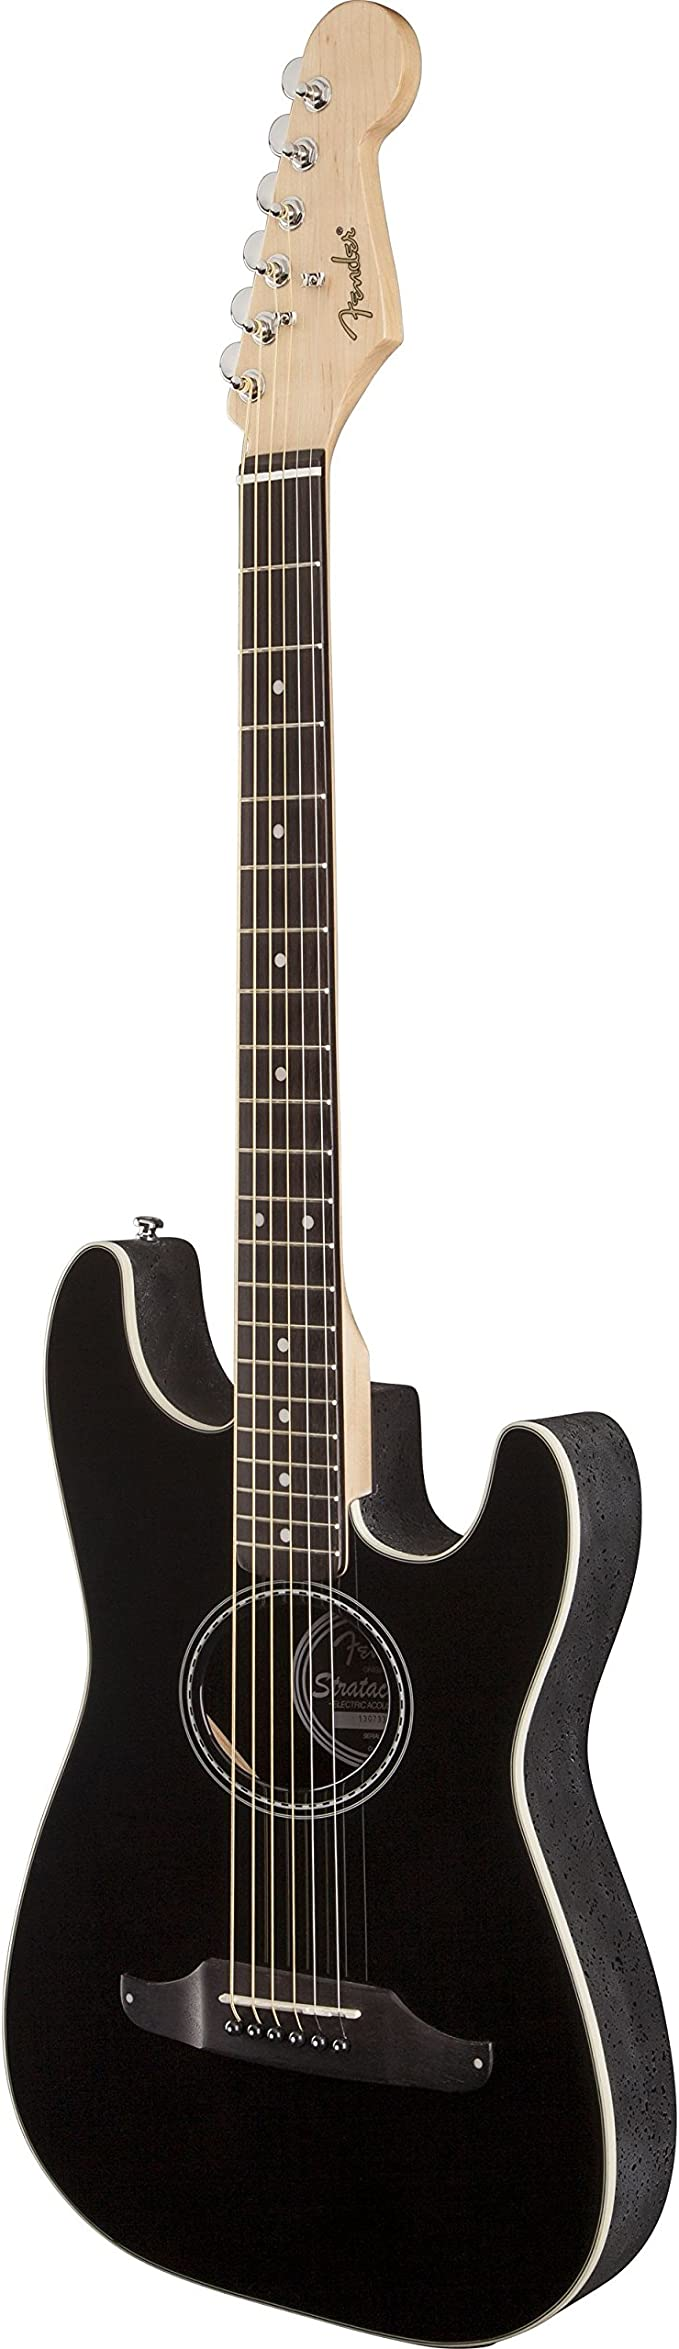 Fender Stratacoustic Standard Black · Guitarra acústica: Amazon.es ...